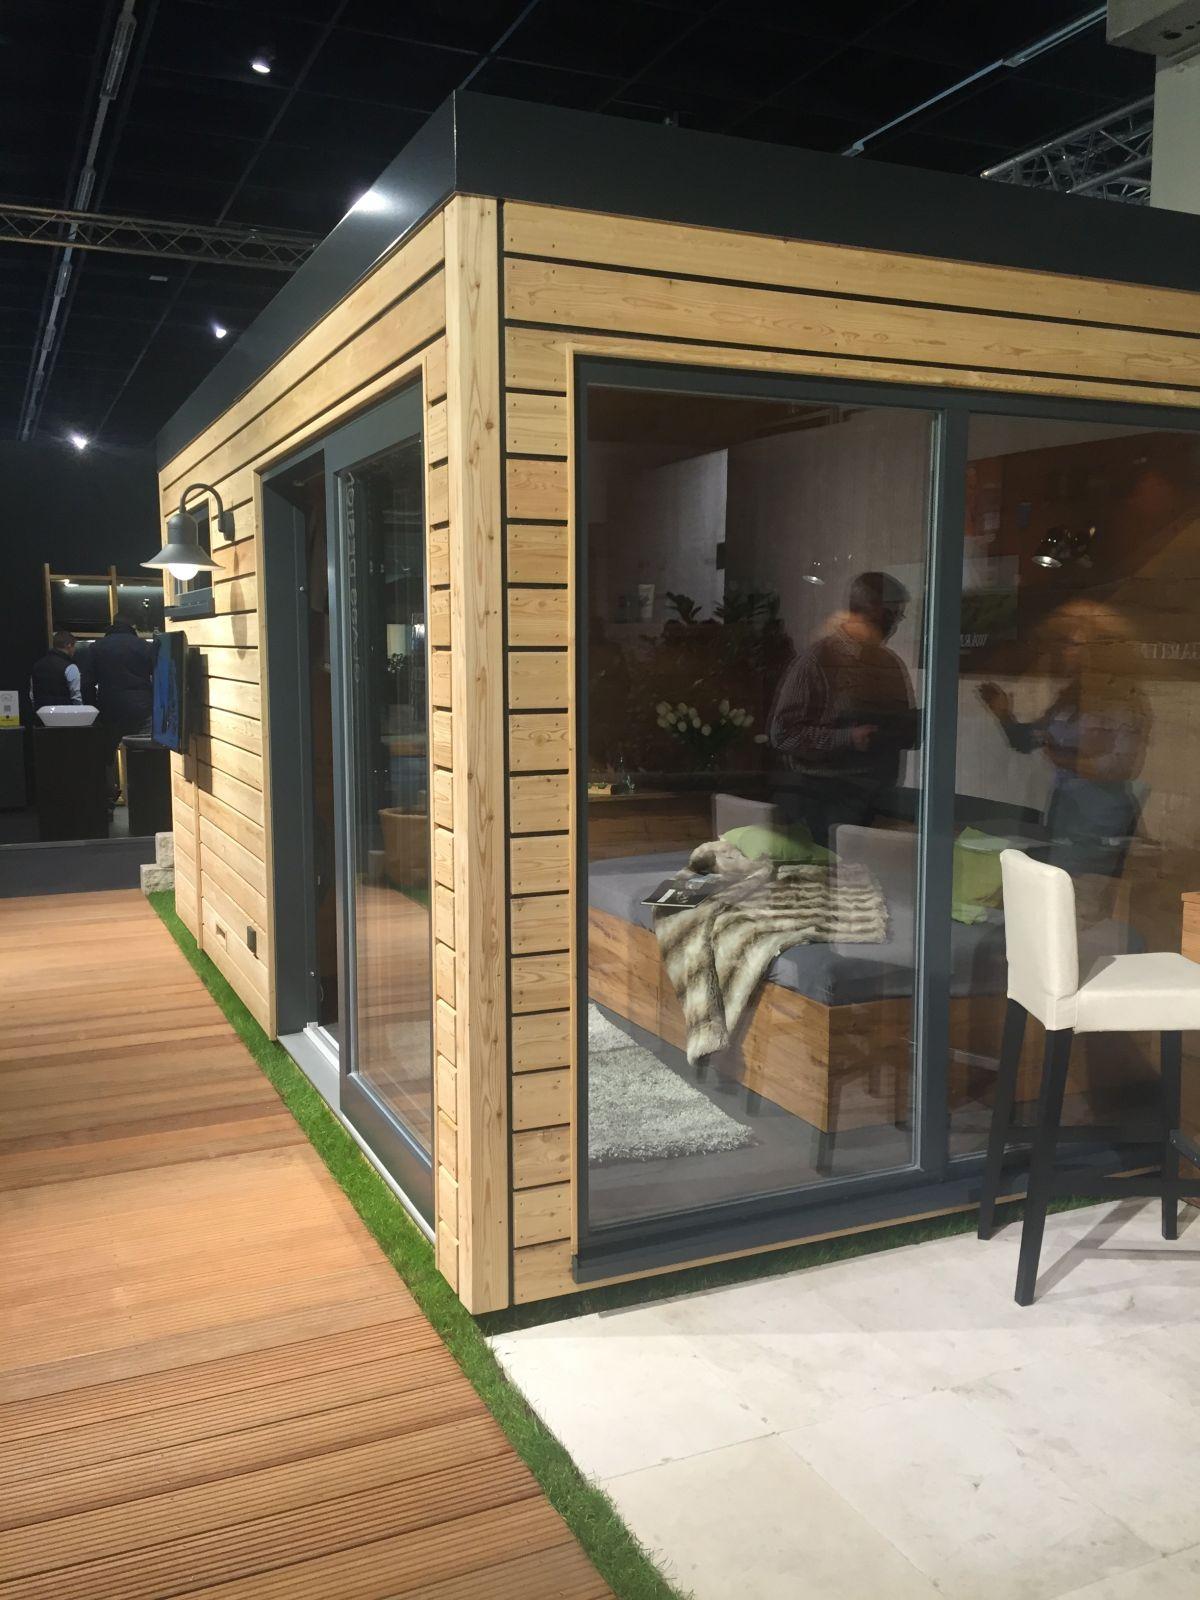 Wärmegrad sauna design